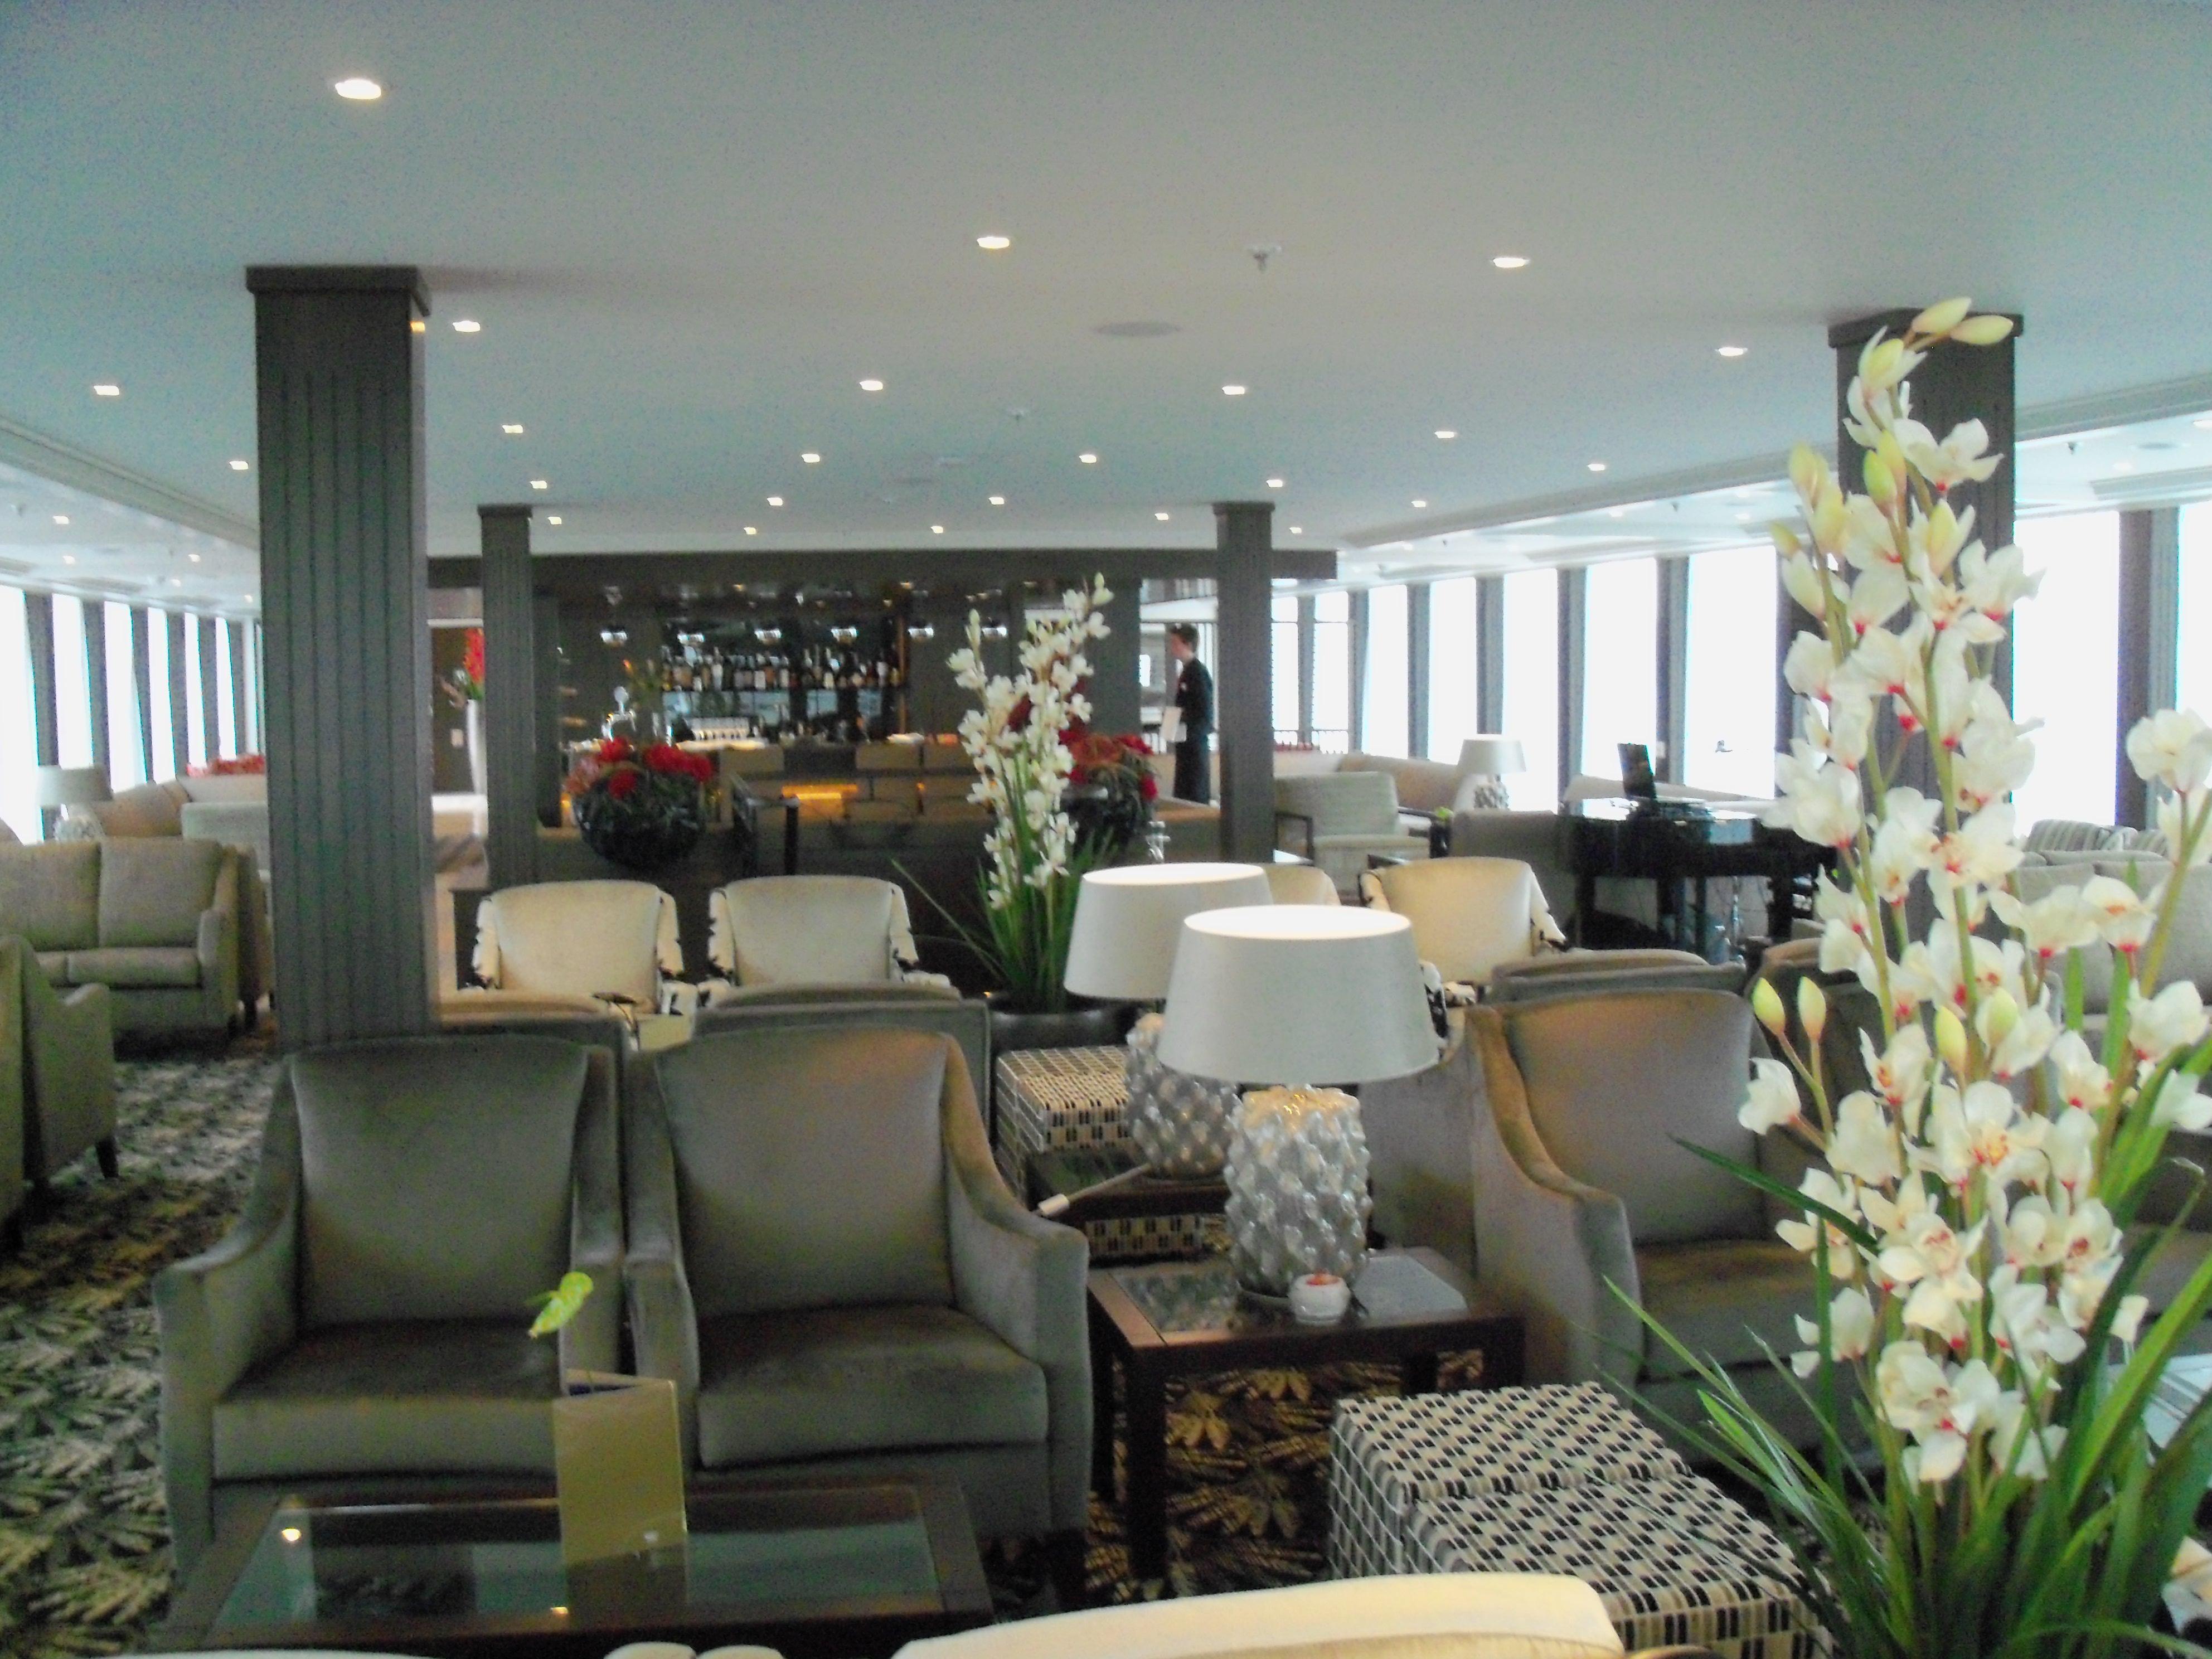 AmaWaterways AmaVerde AmaBella Interior Lounge 2.jpg